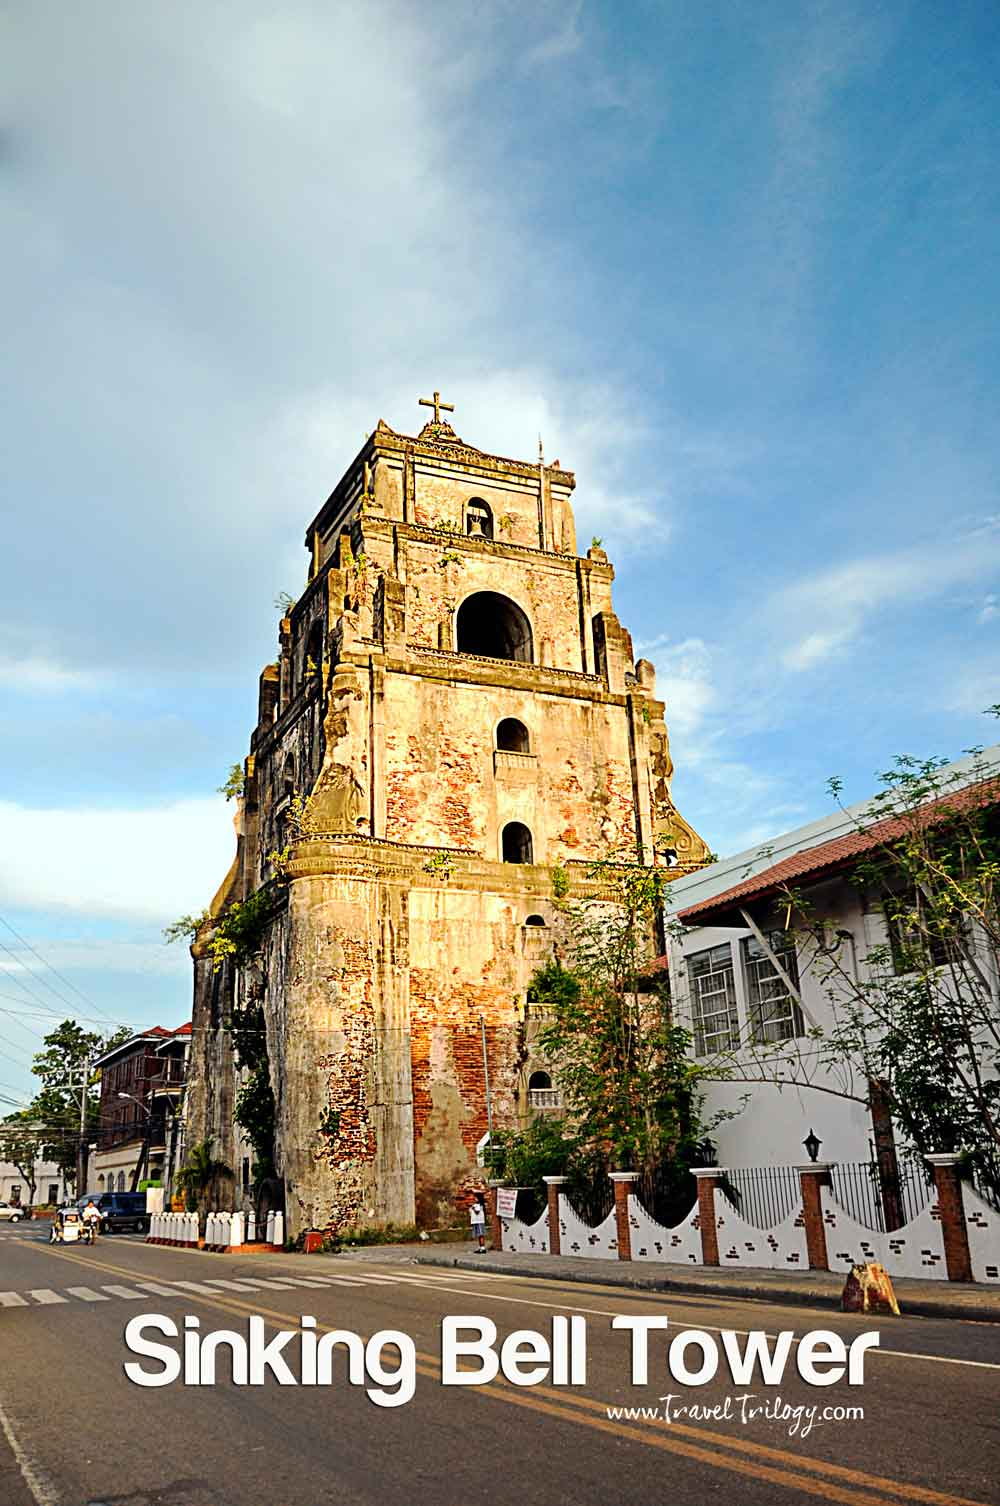 sinking bell tower laoag ilocos norte